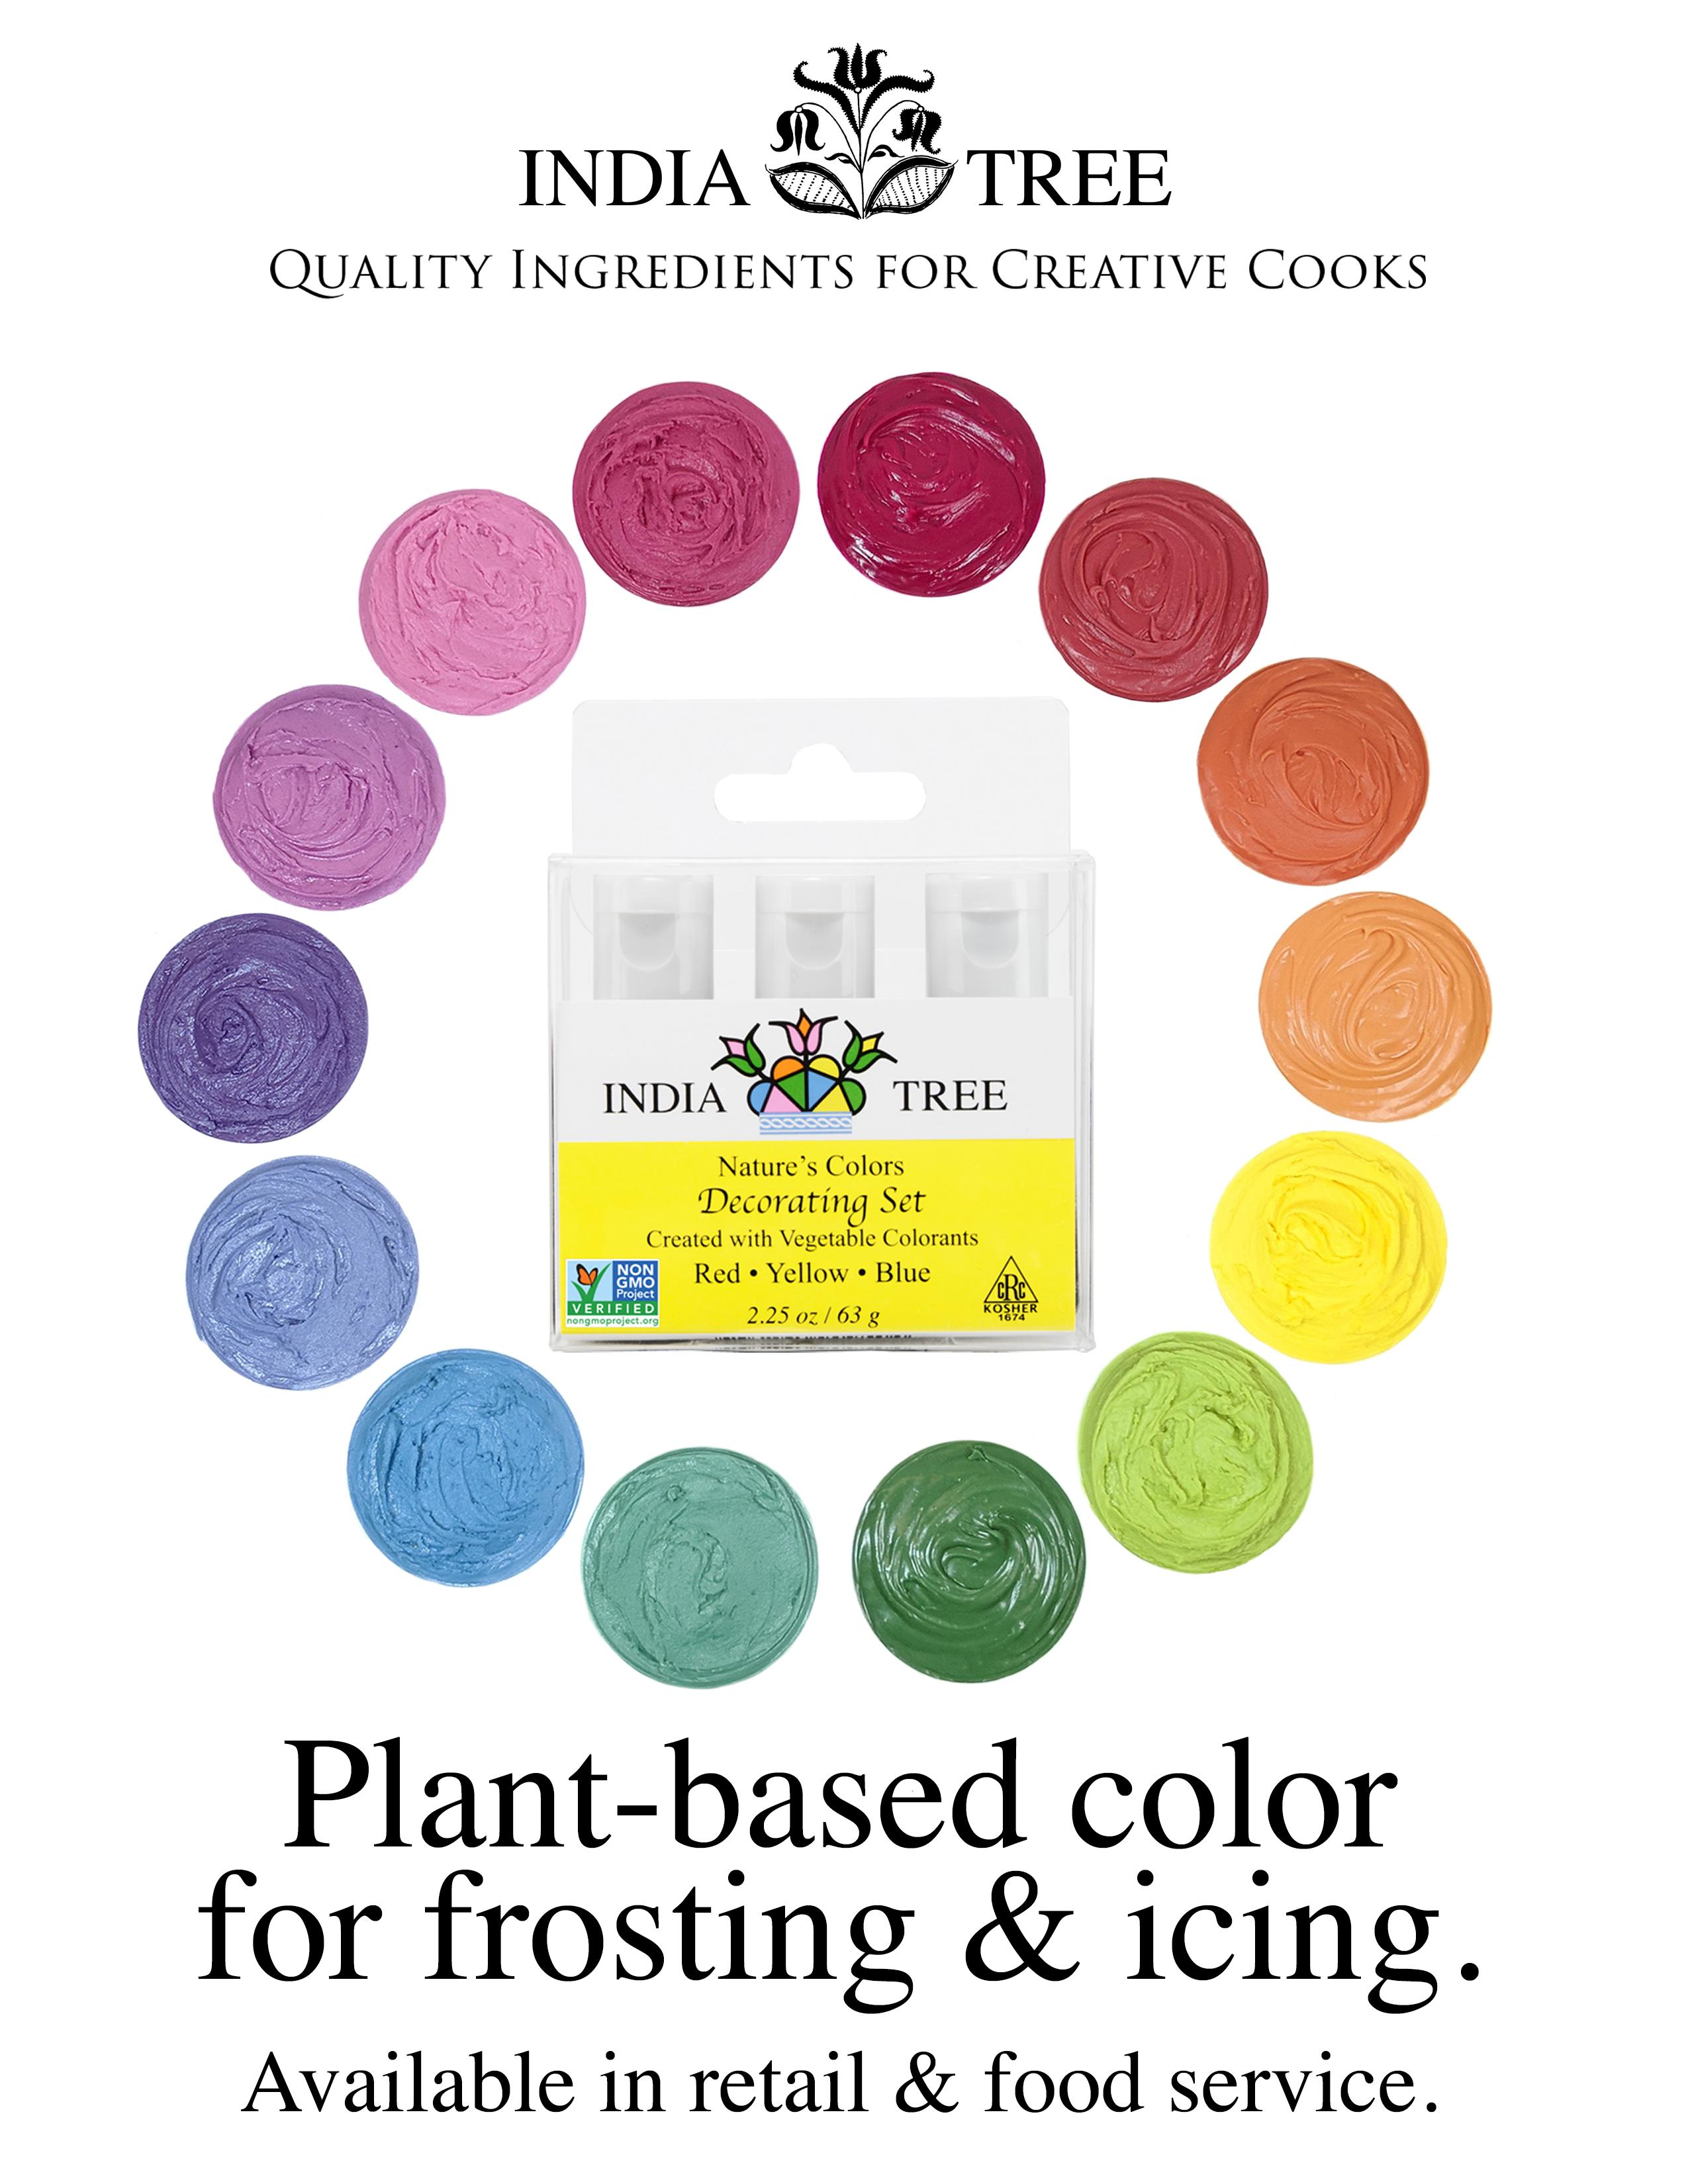 Diy Get Funky Hair At Home Using Food Color Food Coloring Hair Food Coloring Hair Dye Hair Dye For Kids